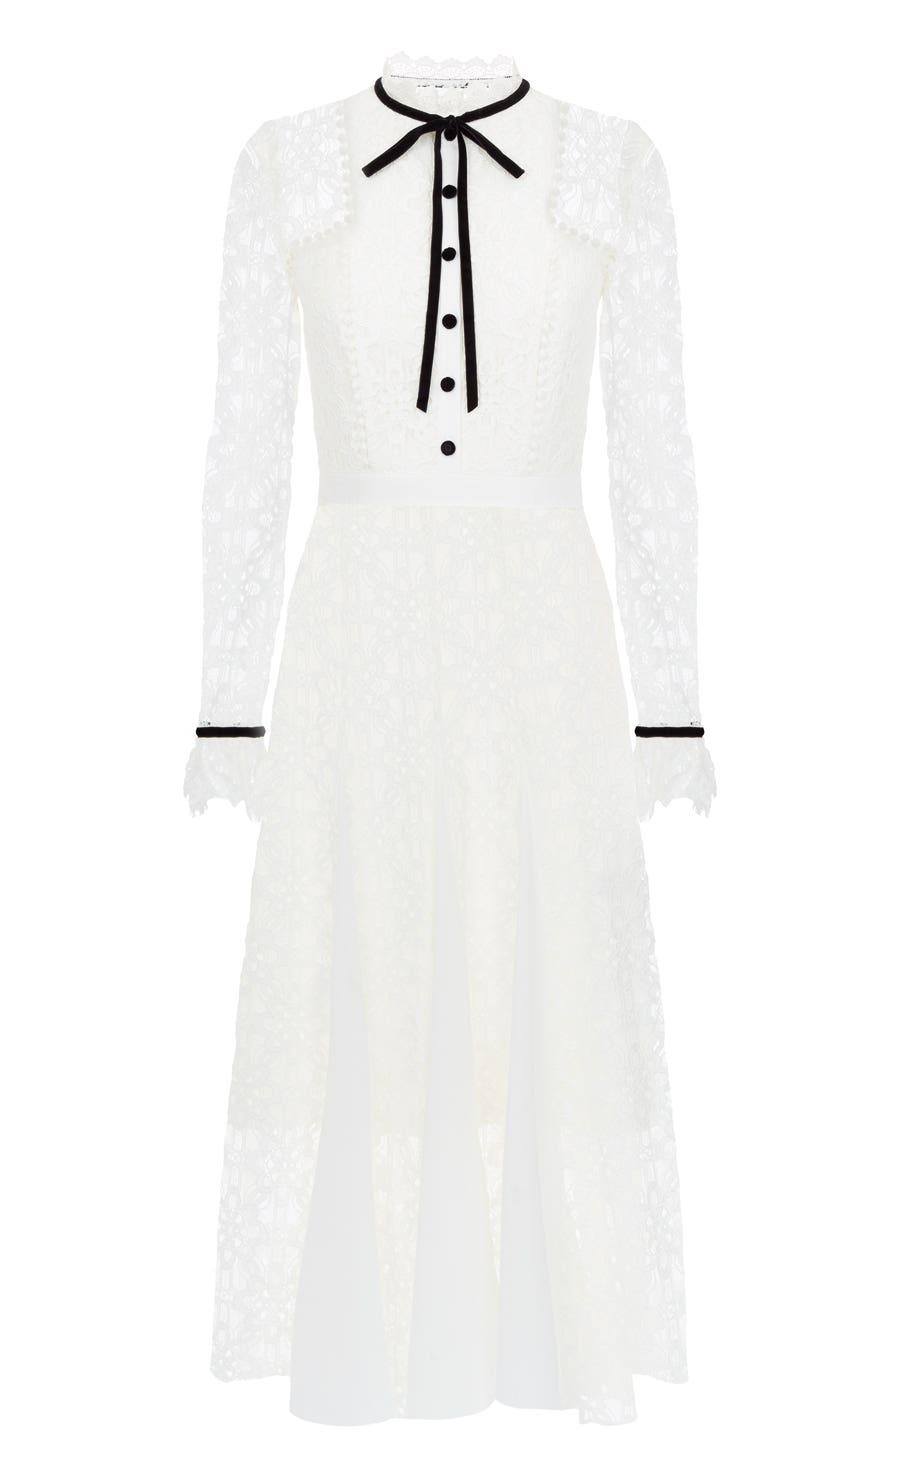 Eclipse Lace Collar Dress, White